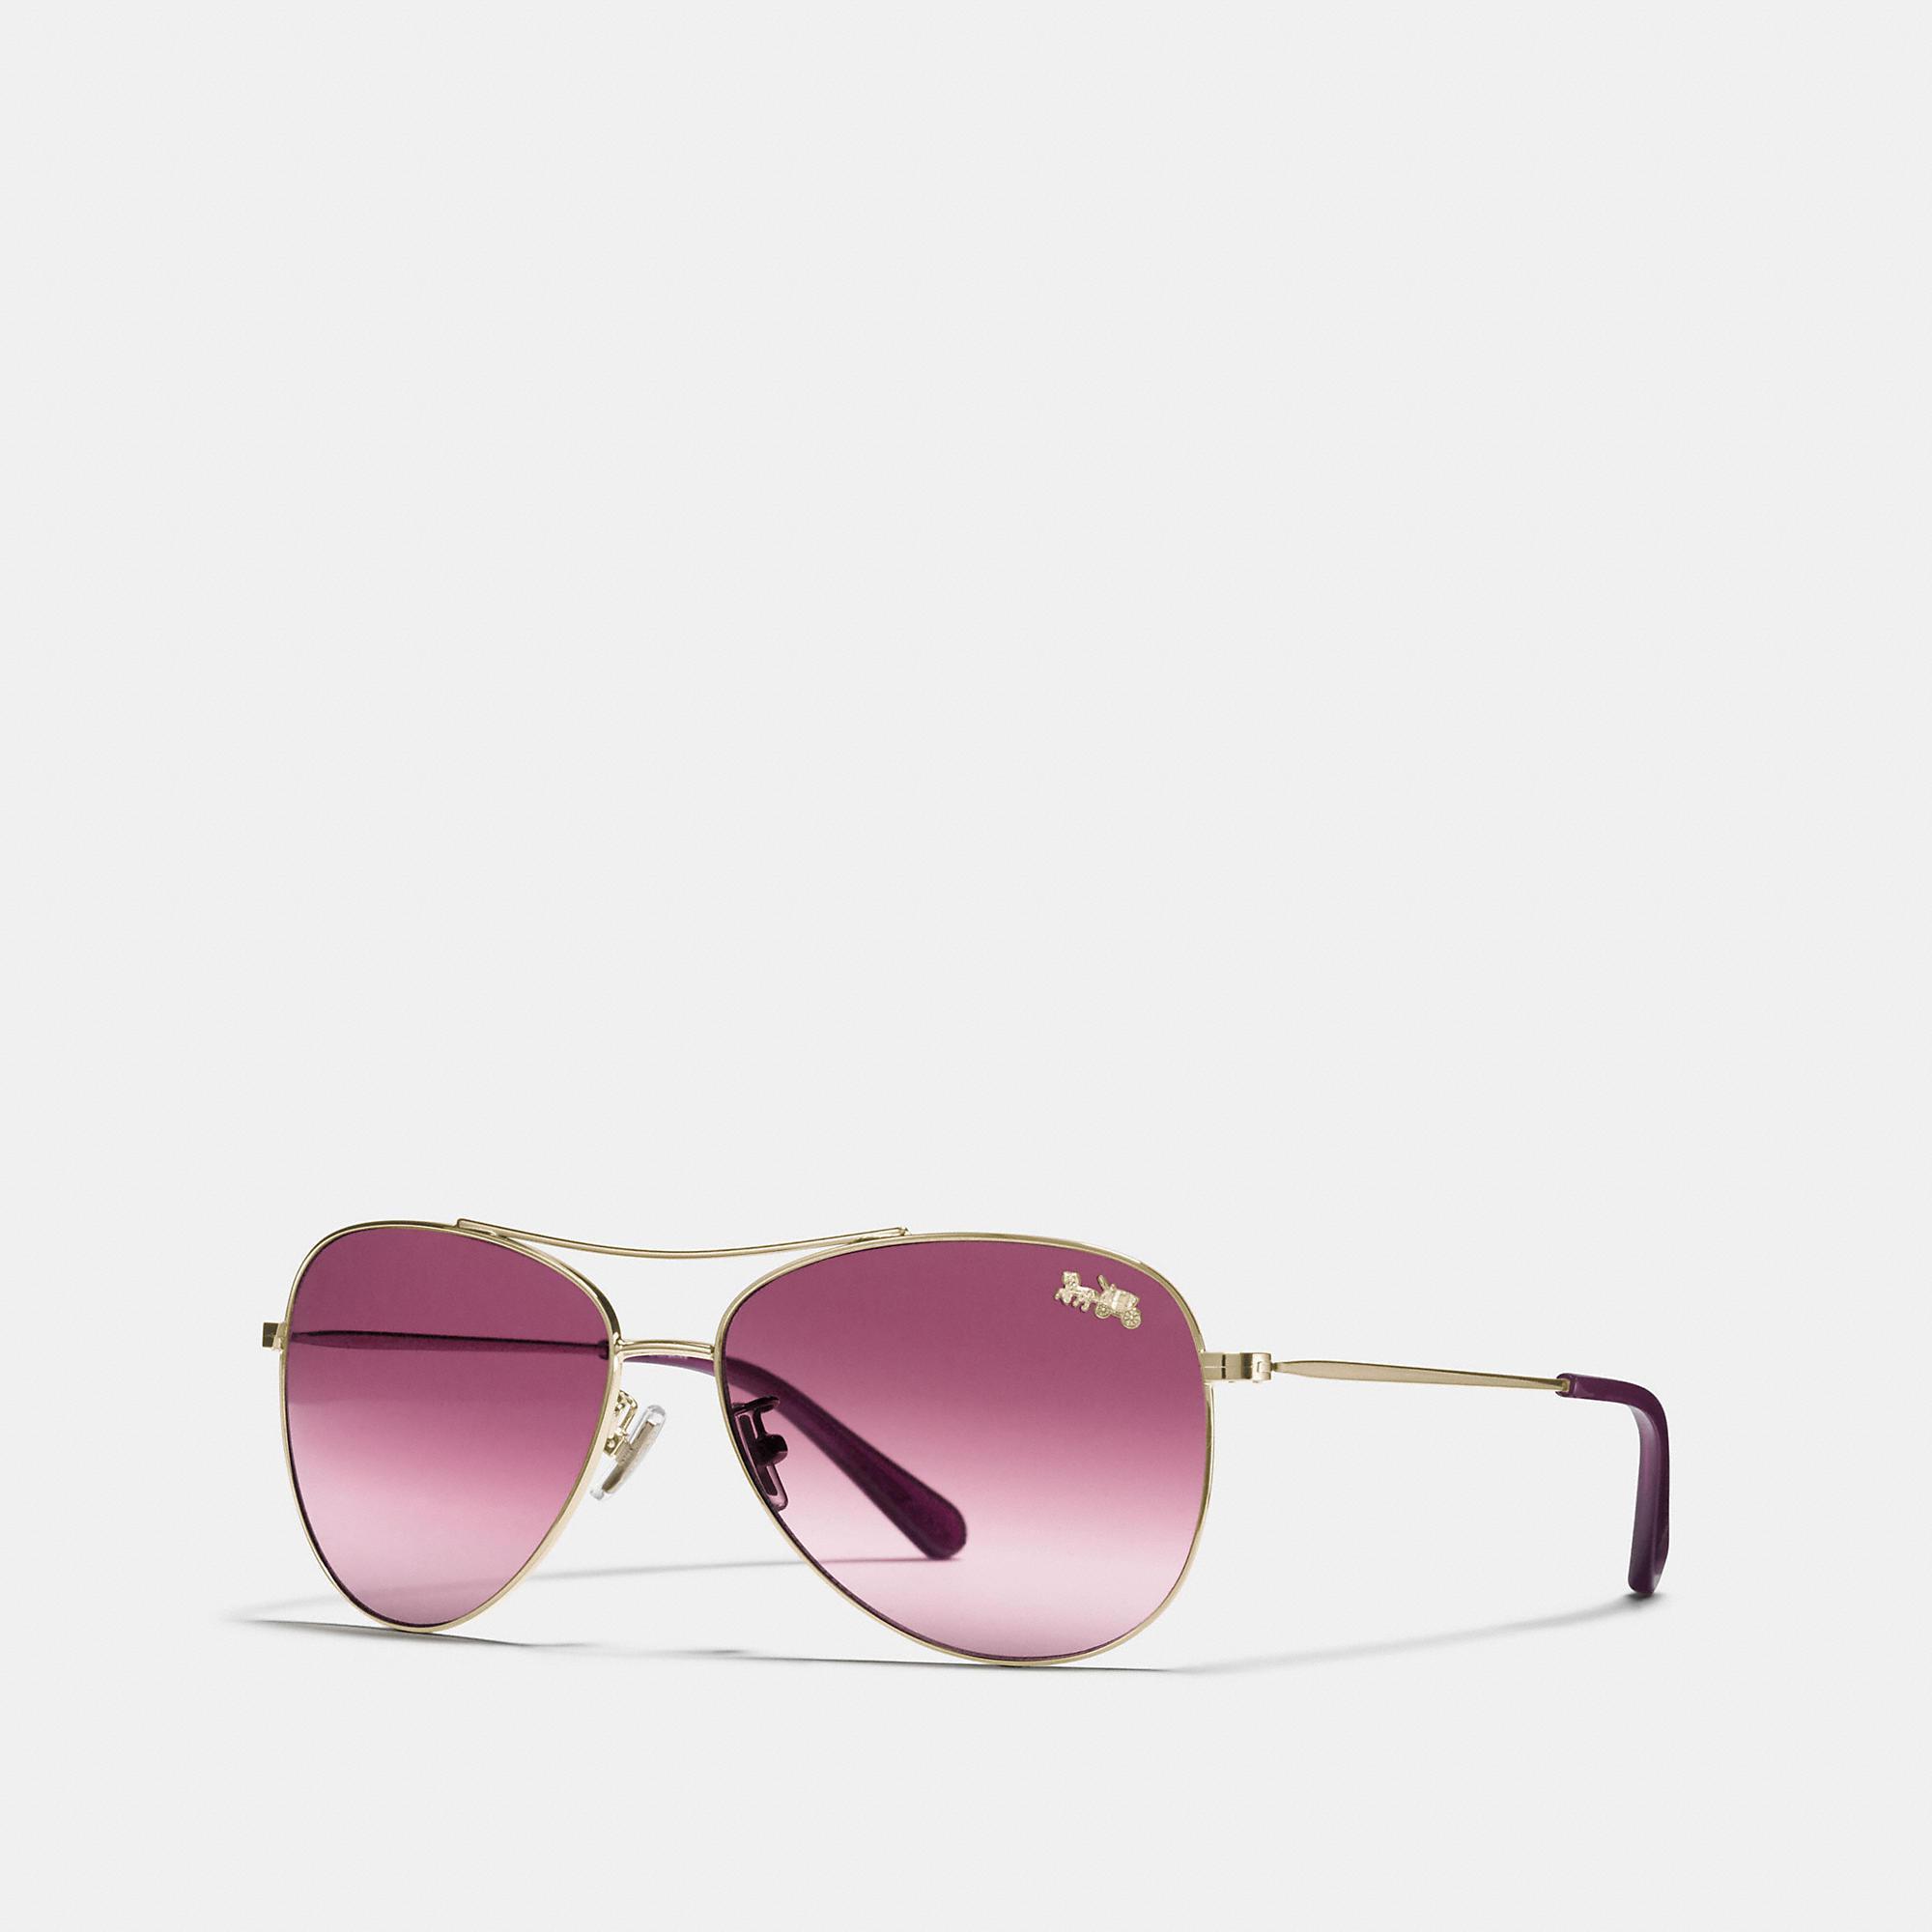 8f745bf0a069e COACH Thin Metal Pilot Sunglasses - Lyst